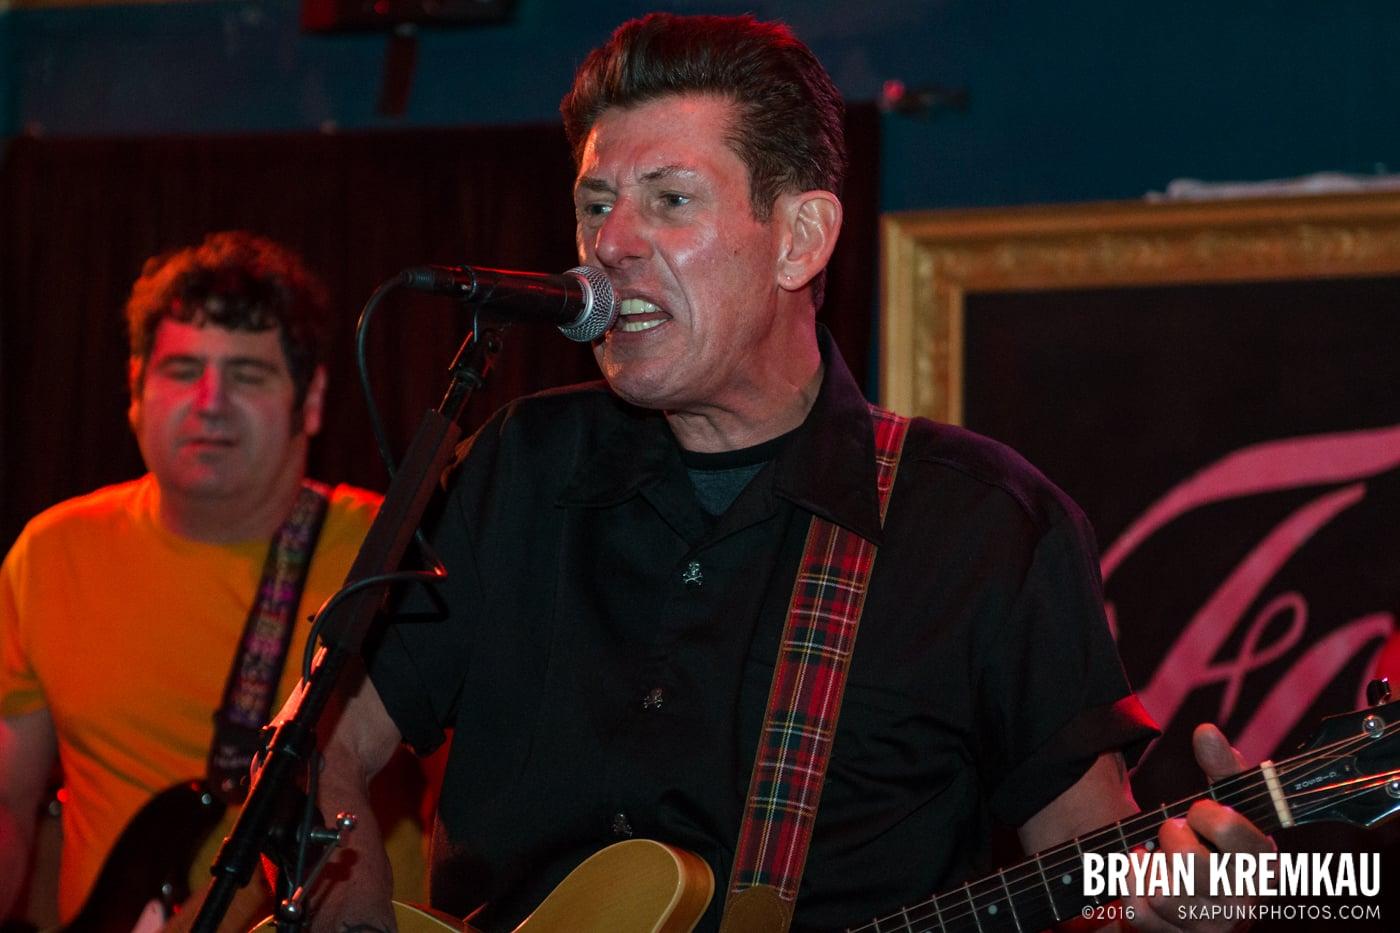 Roddy Radiation & The Scotch Bonnets @ Fontana's, NYC - 4.25.15 (20)